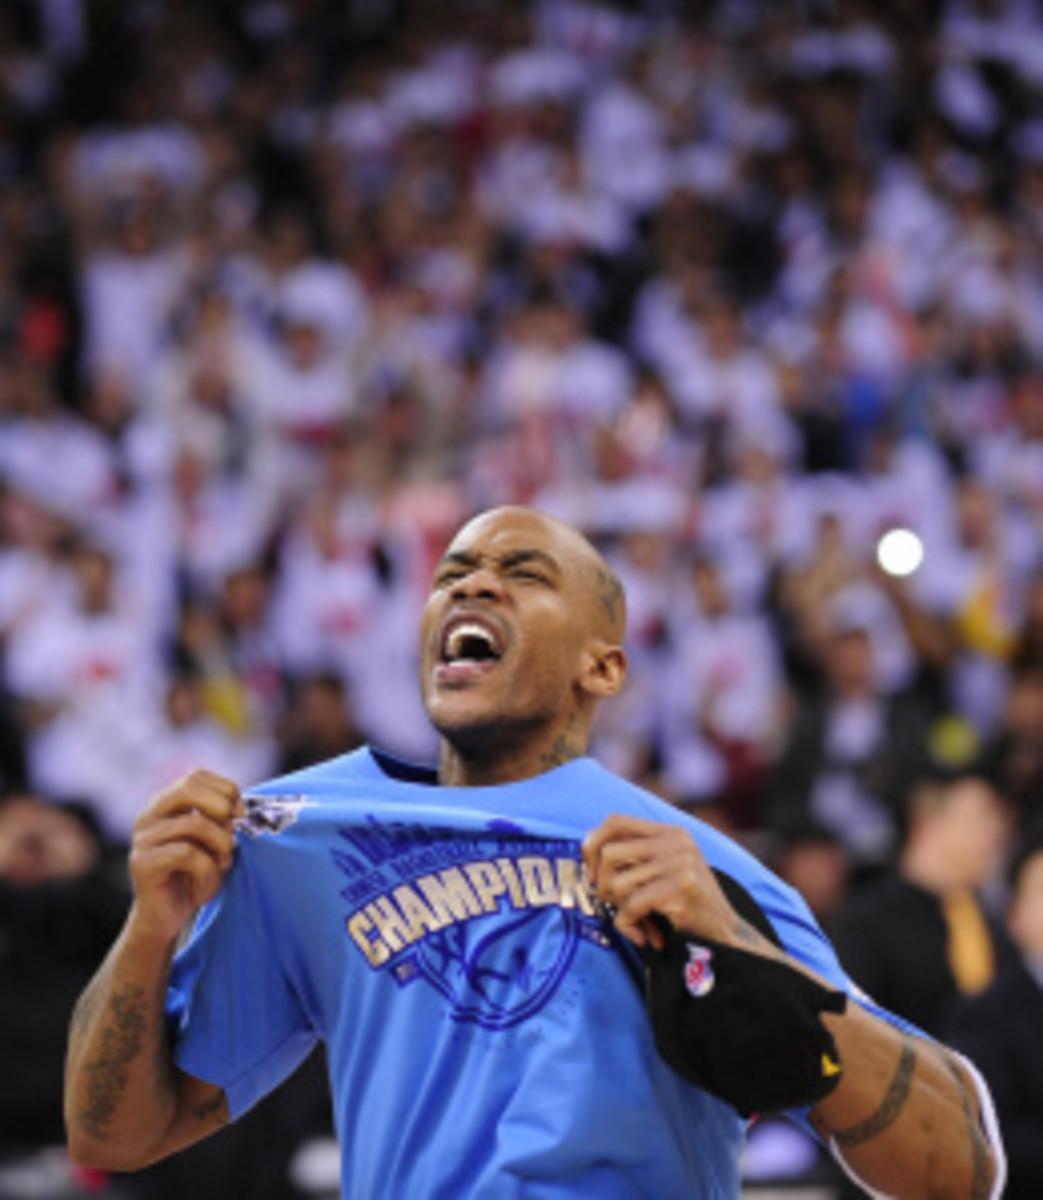 Former NBA superstar Stephon Marbury cel